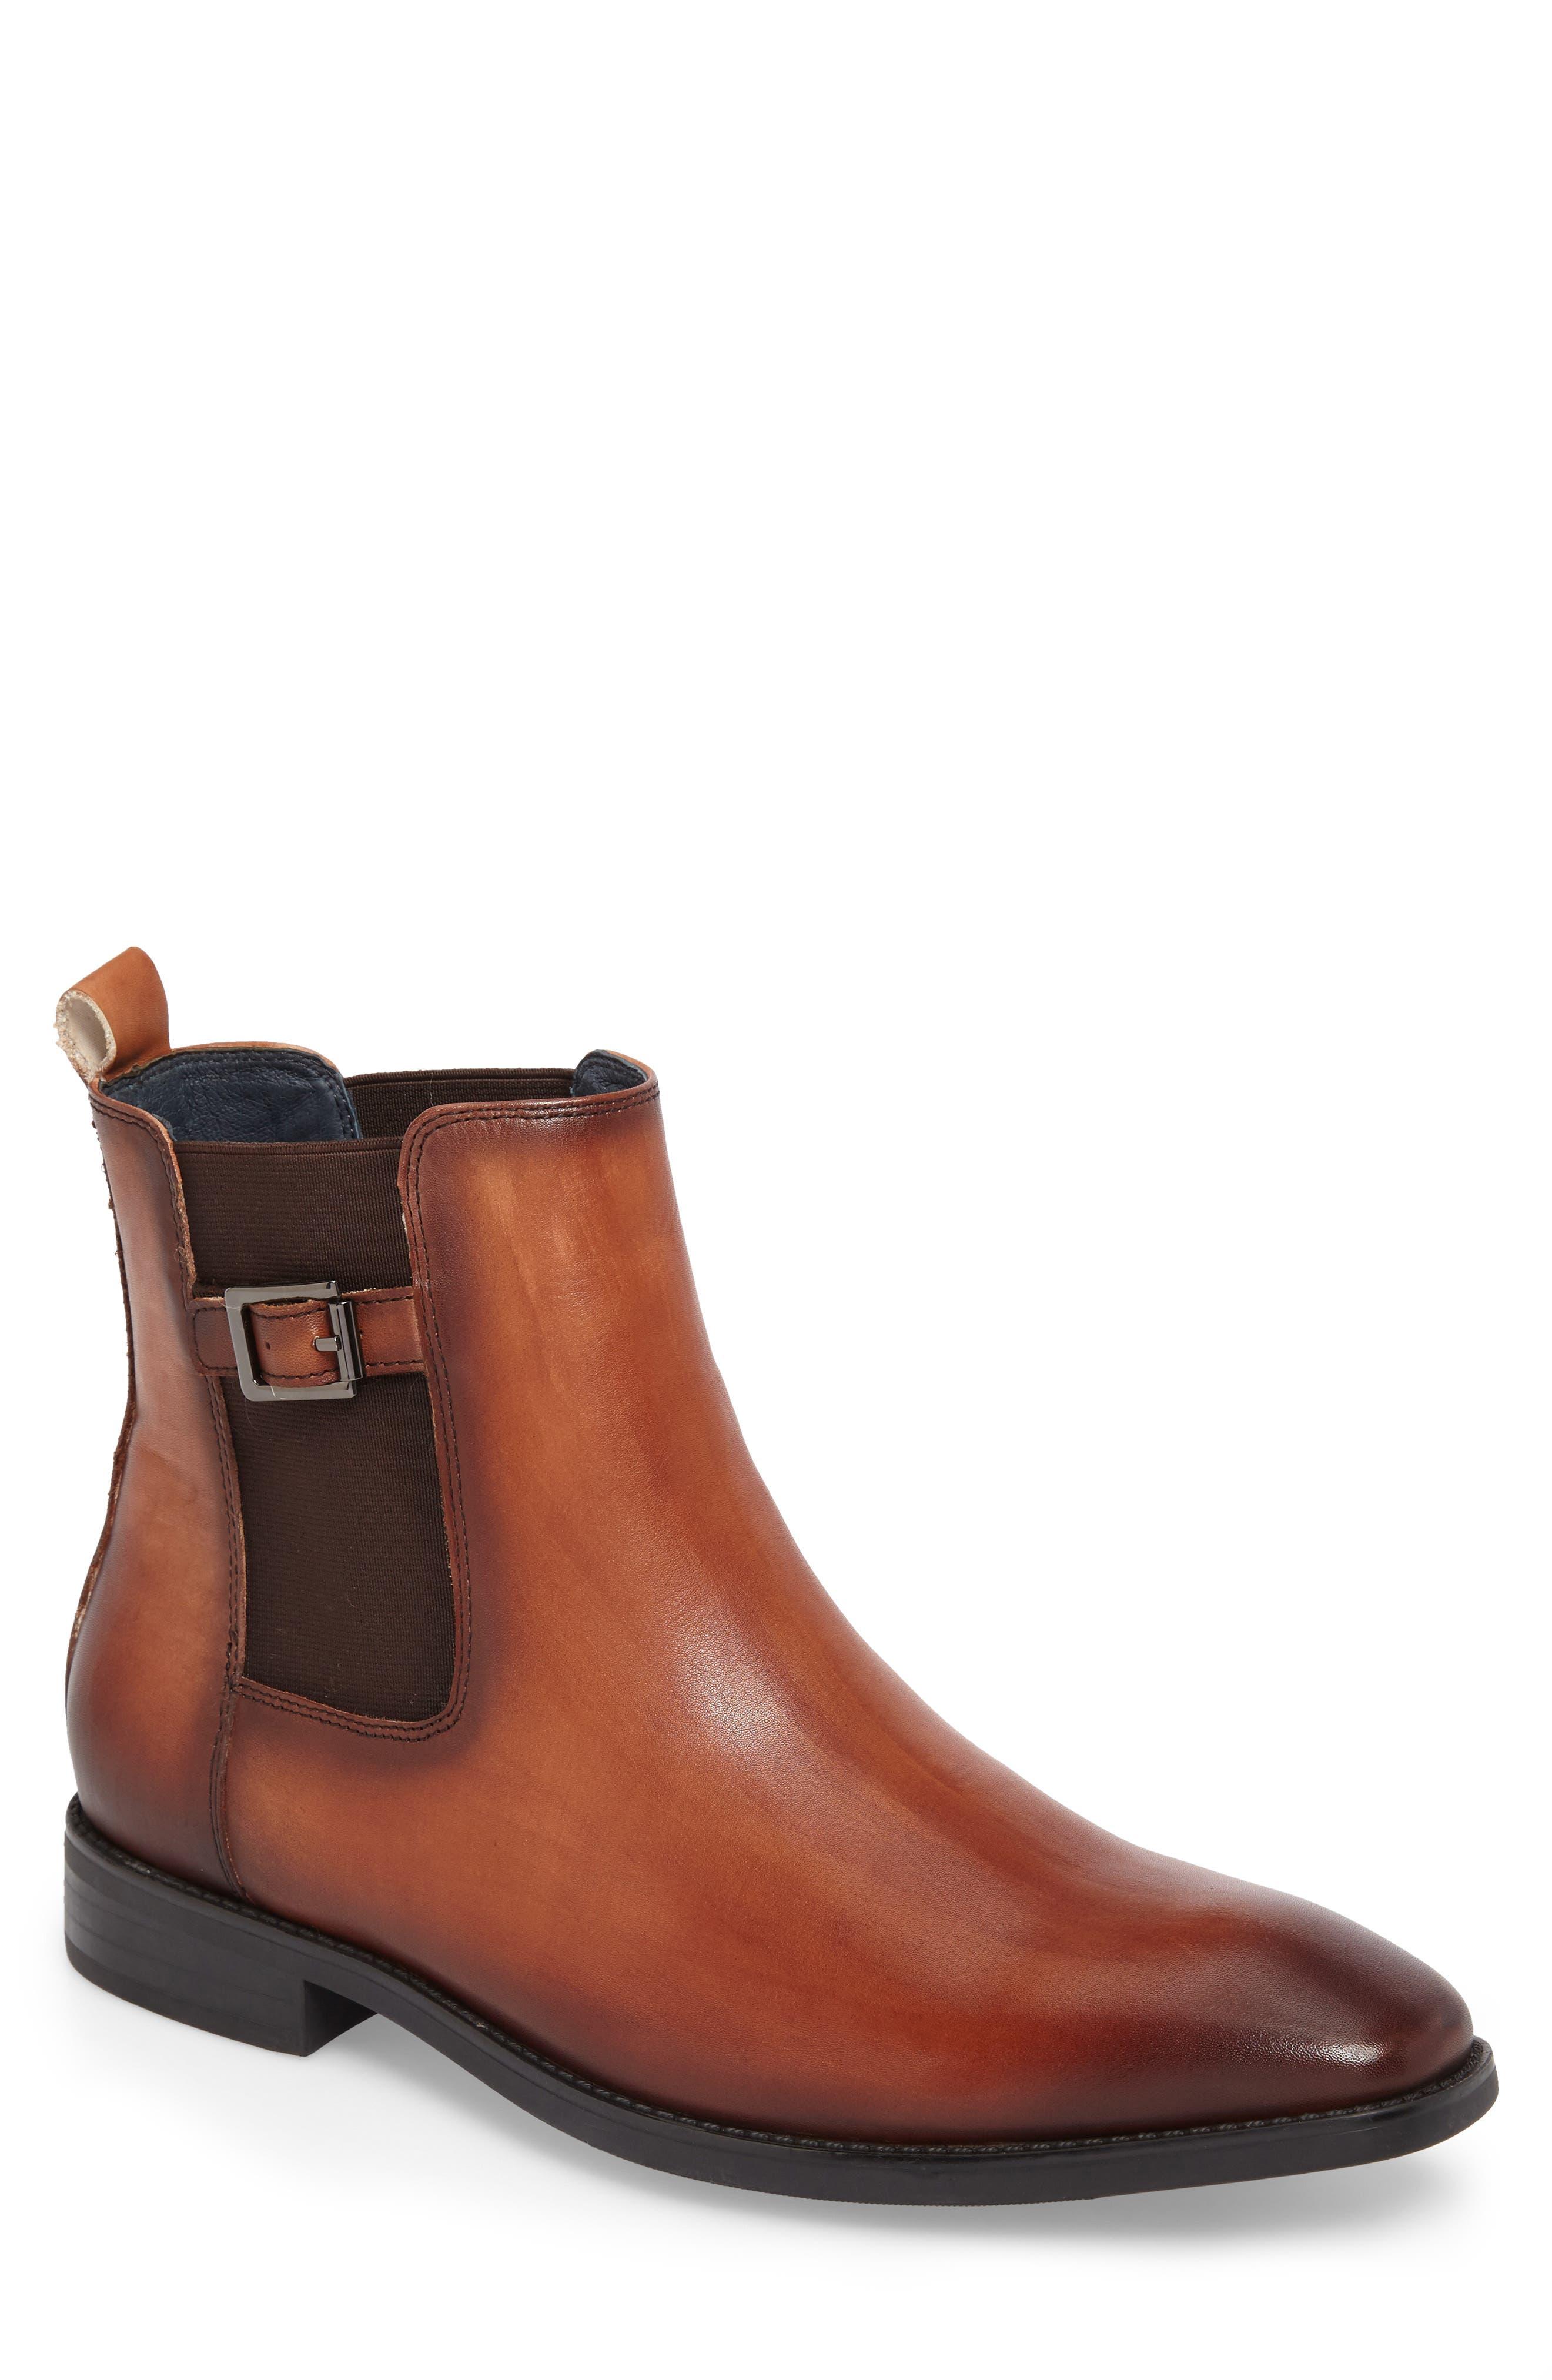 Alternate Image 1 Selected - Jump Loden Chelsea Boot (Men)